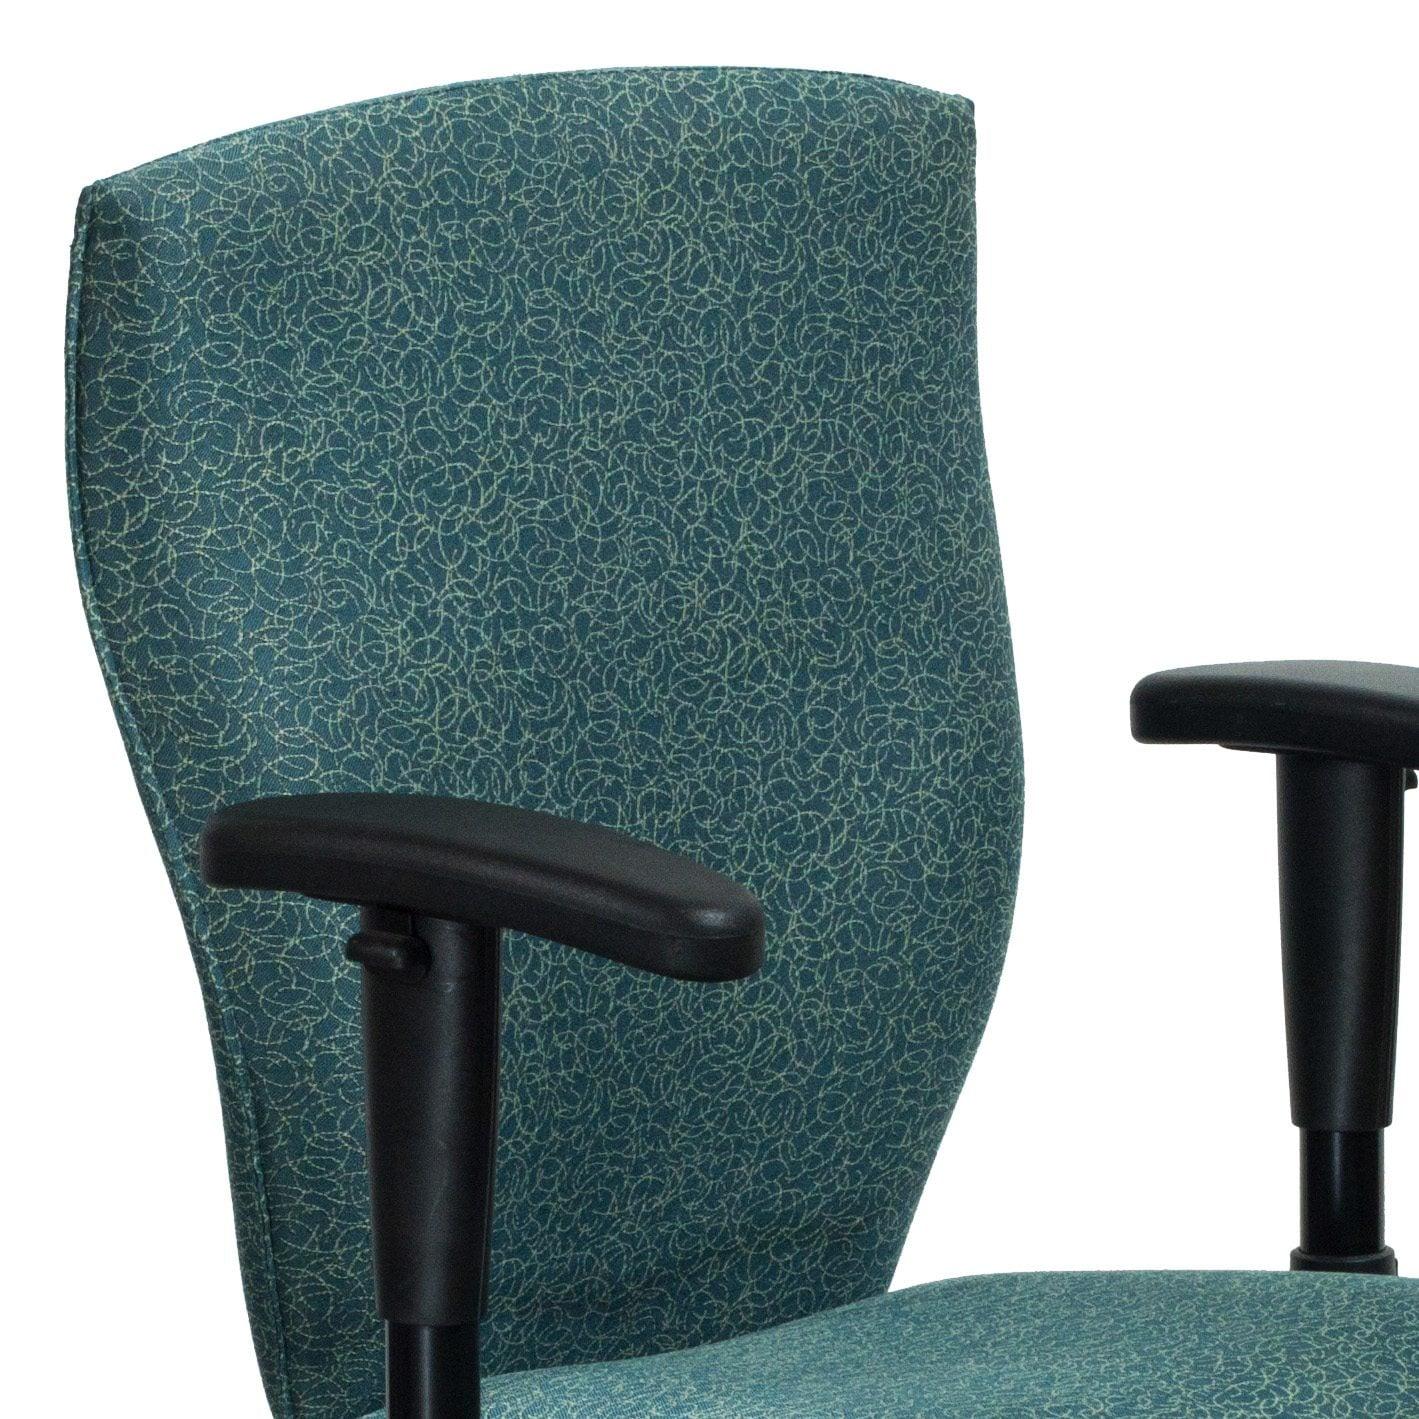 Allsteel Energy Used Task Chair Patterned